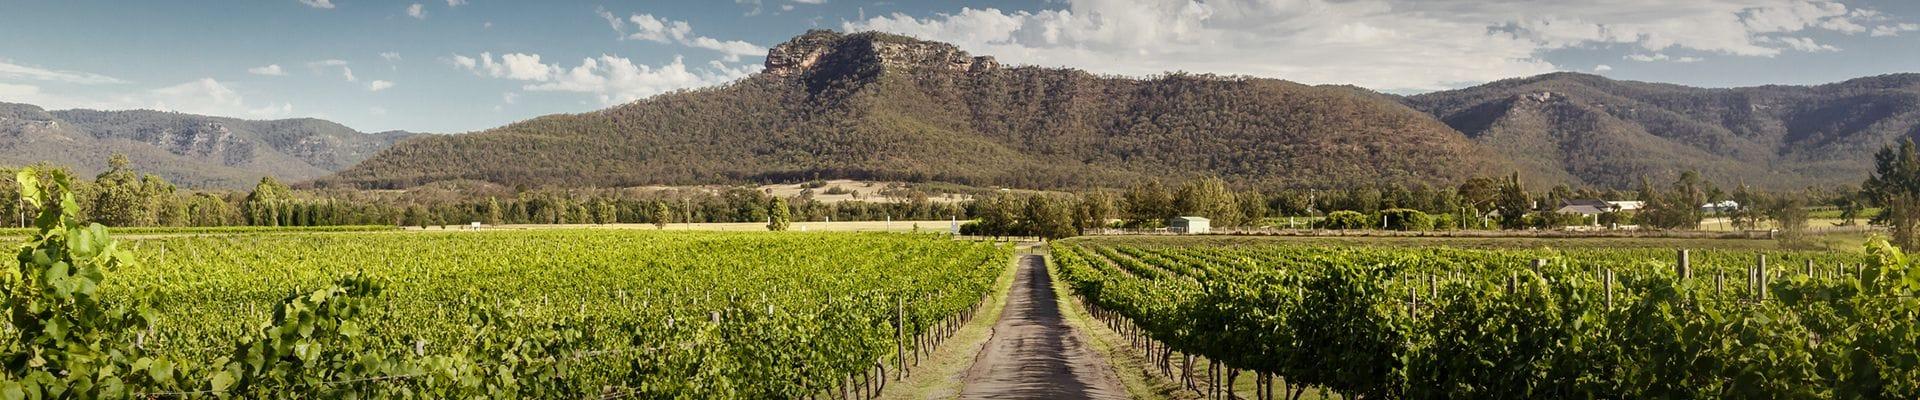 Pokolbin Hire Cars Hunter Valley Wine Tours